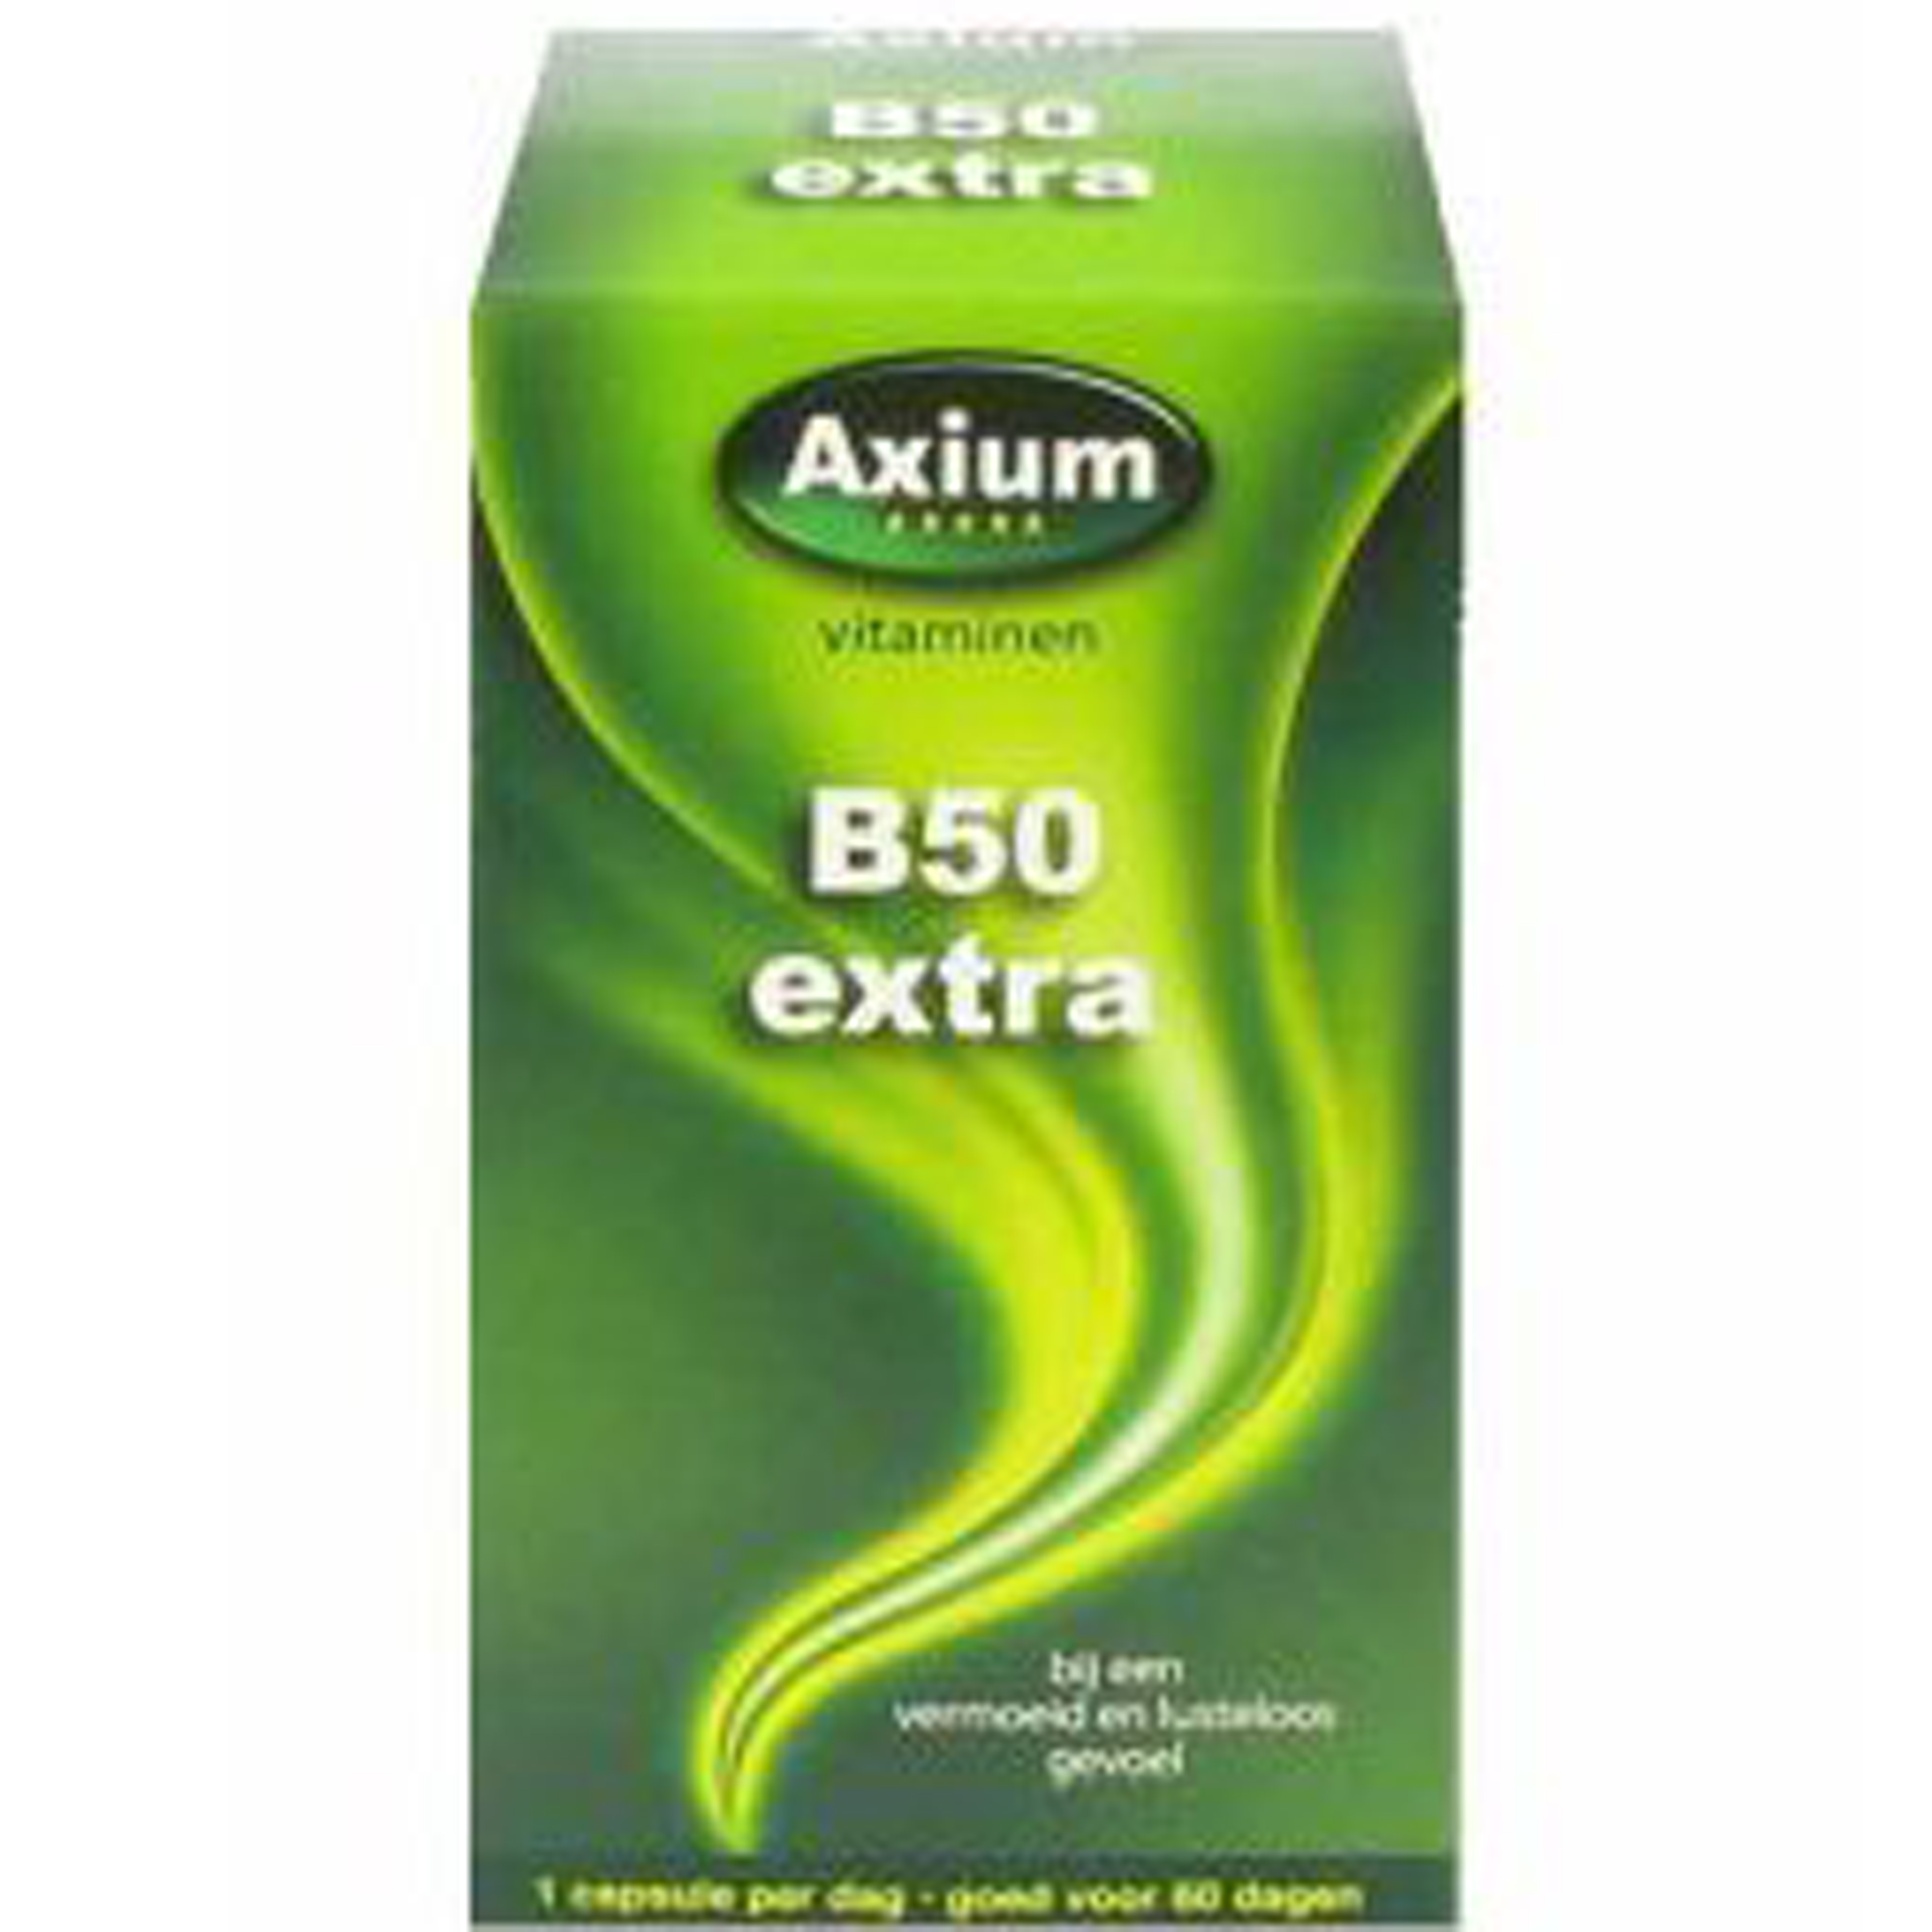 Axium B50 Extra